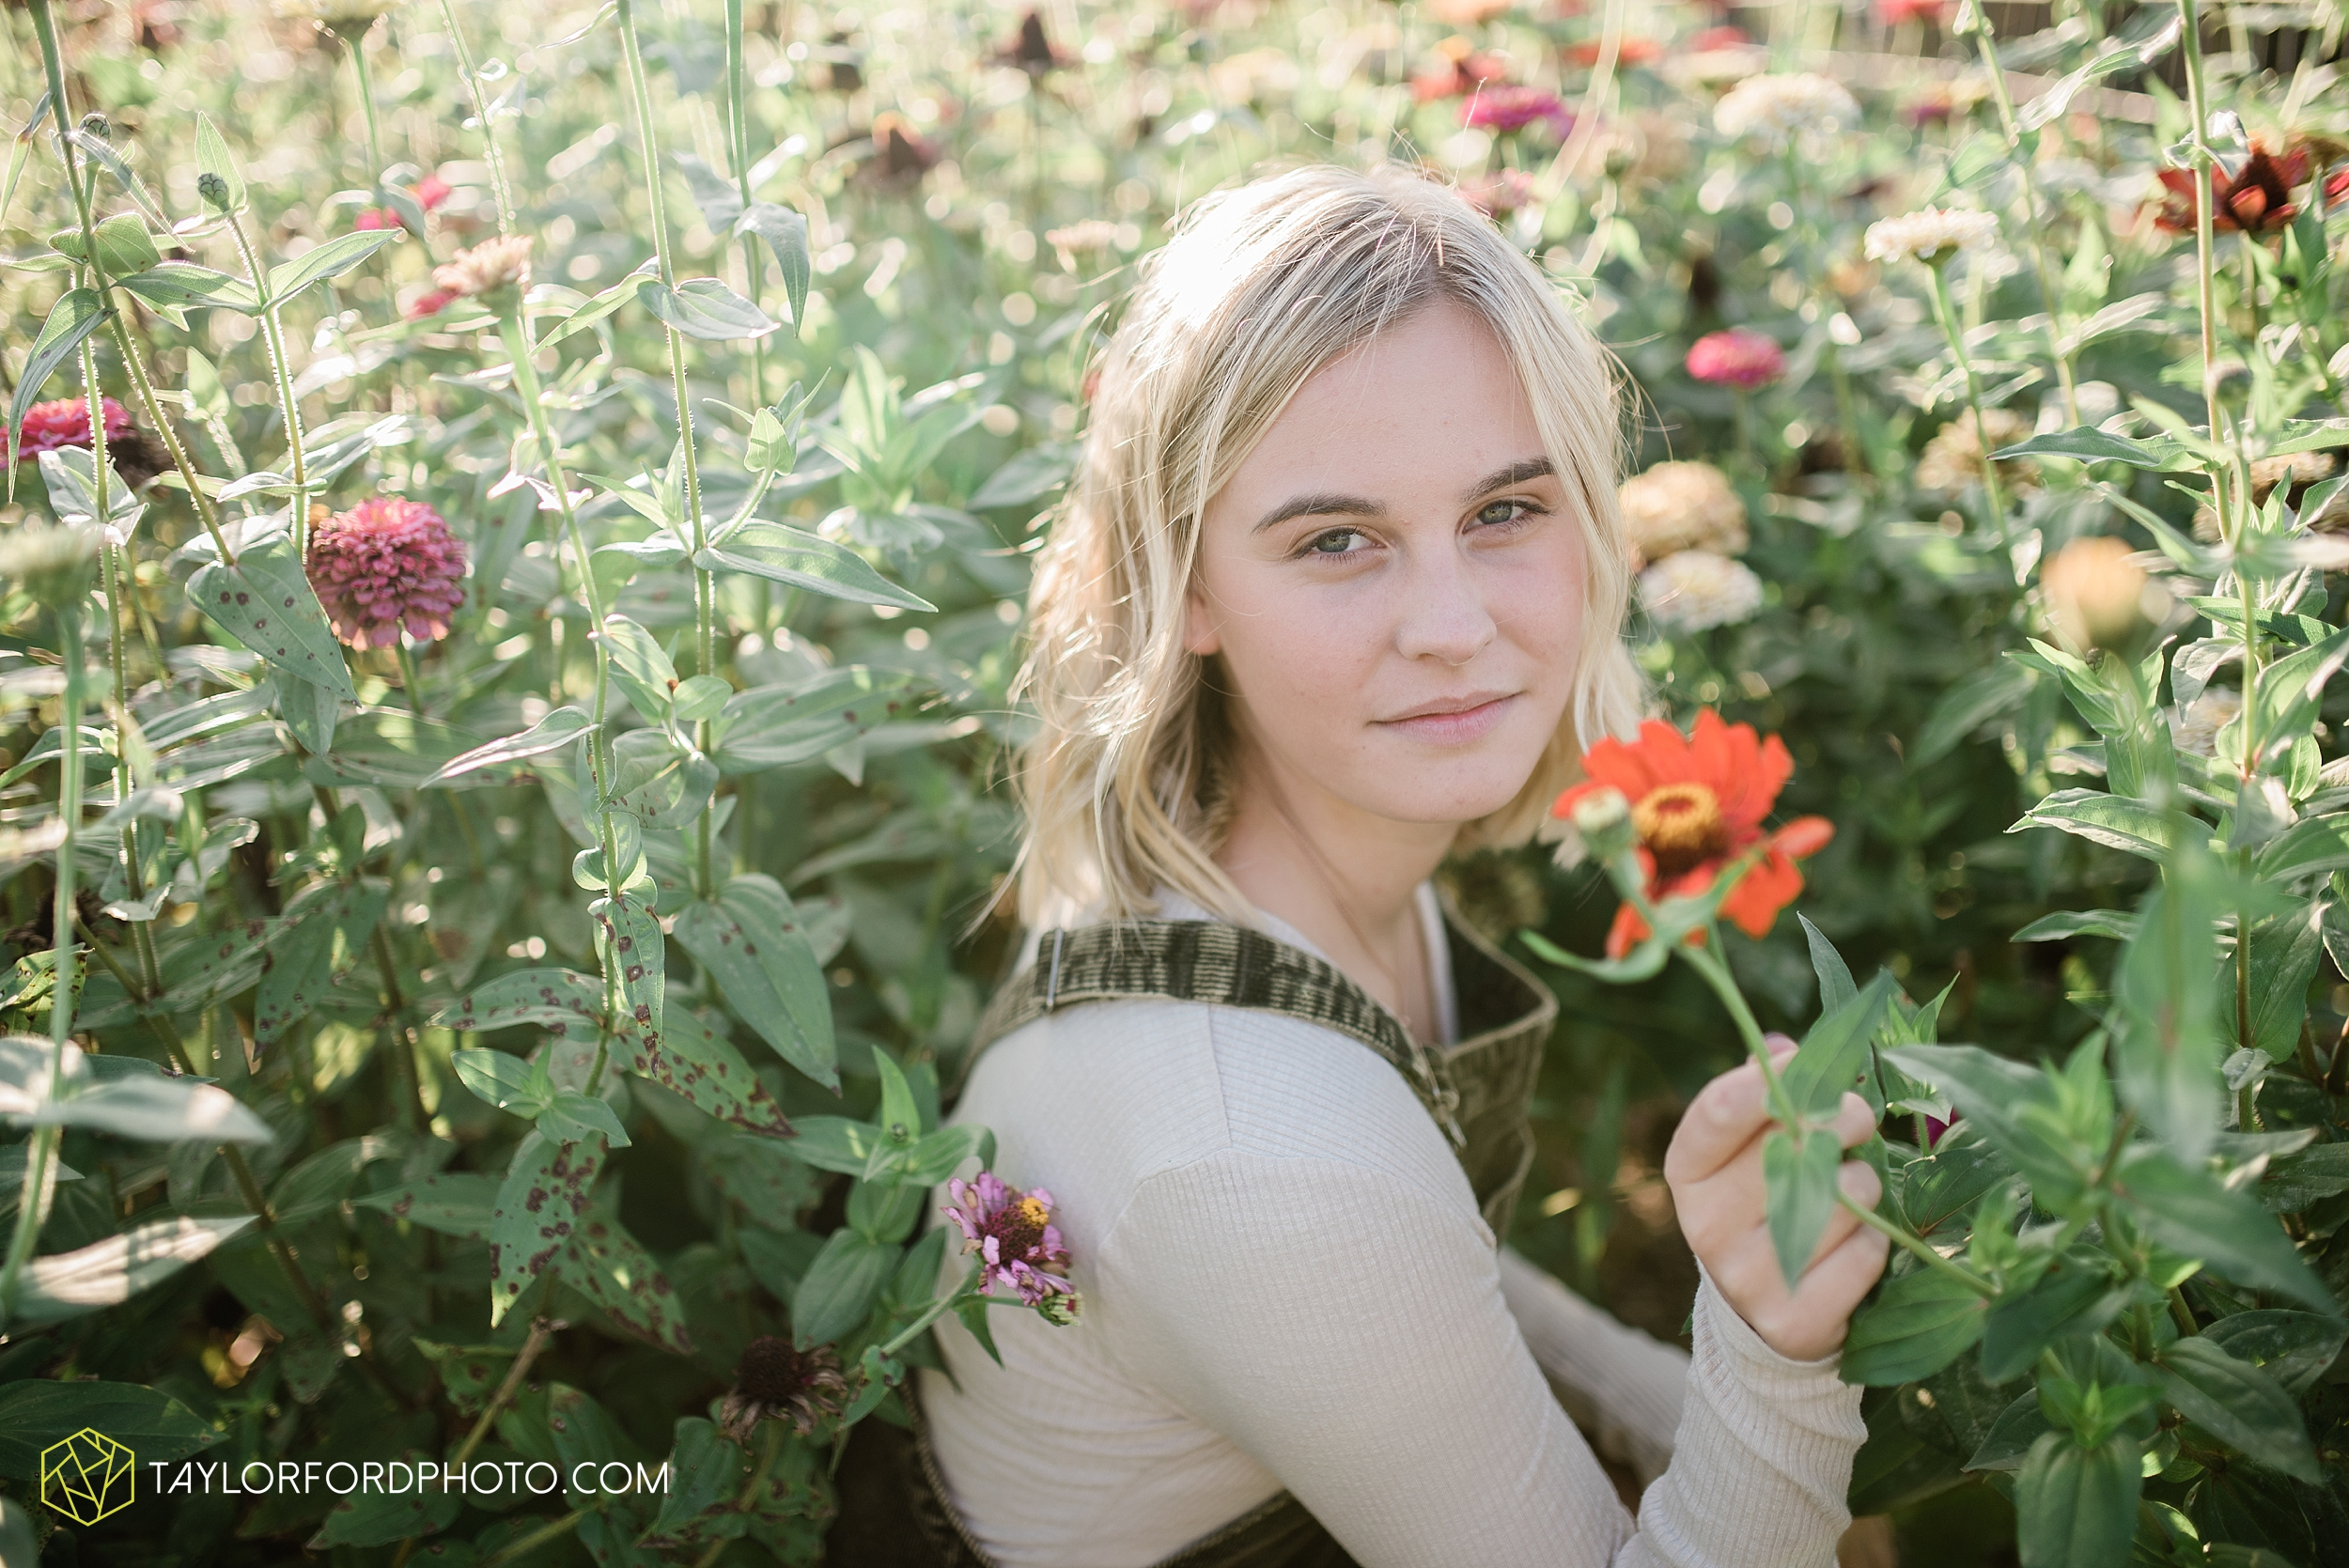 van-wert-high-school-ohio-senior-girl-downtown-cougar-photographer-taylor-ford-photography_0941.jpg